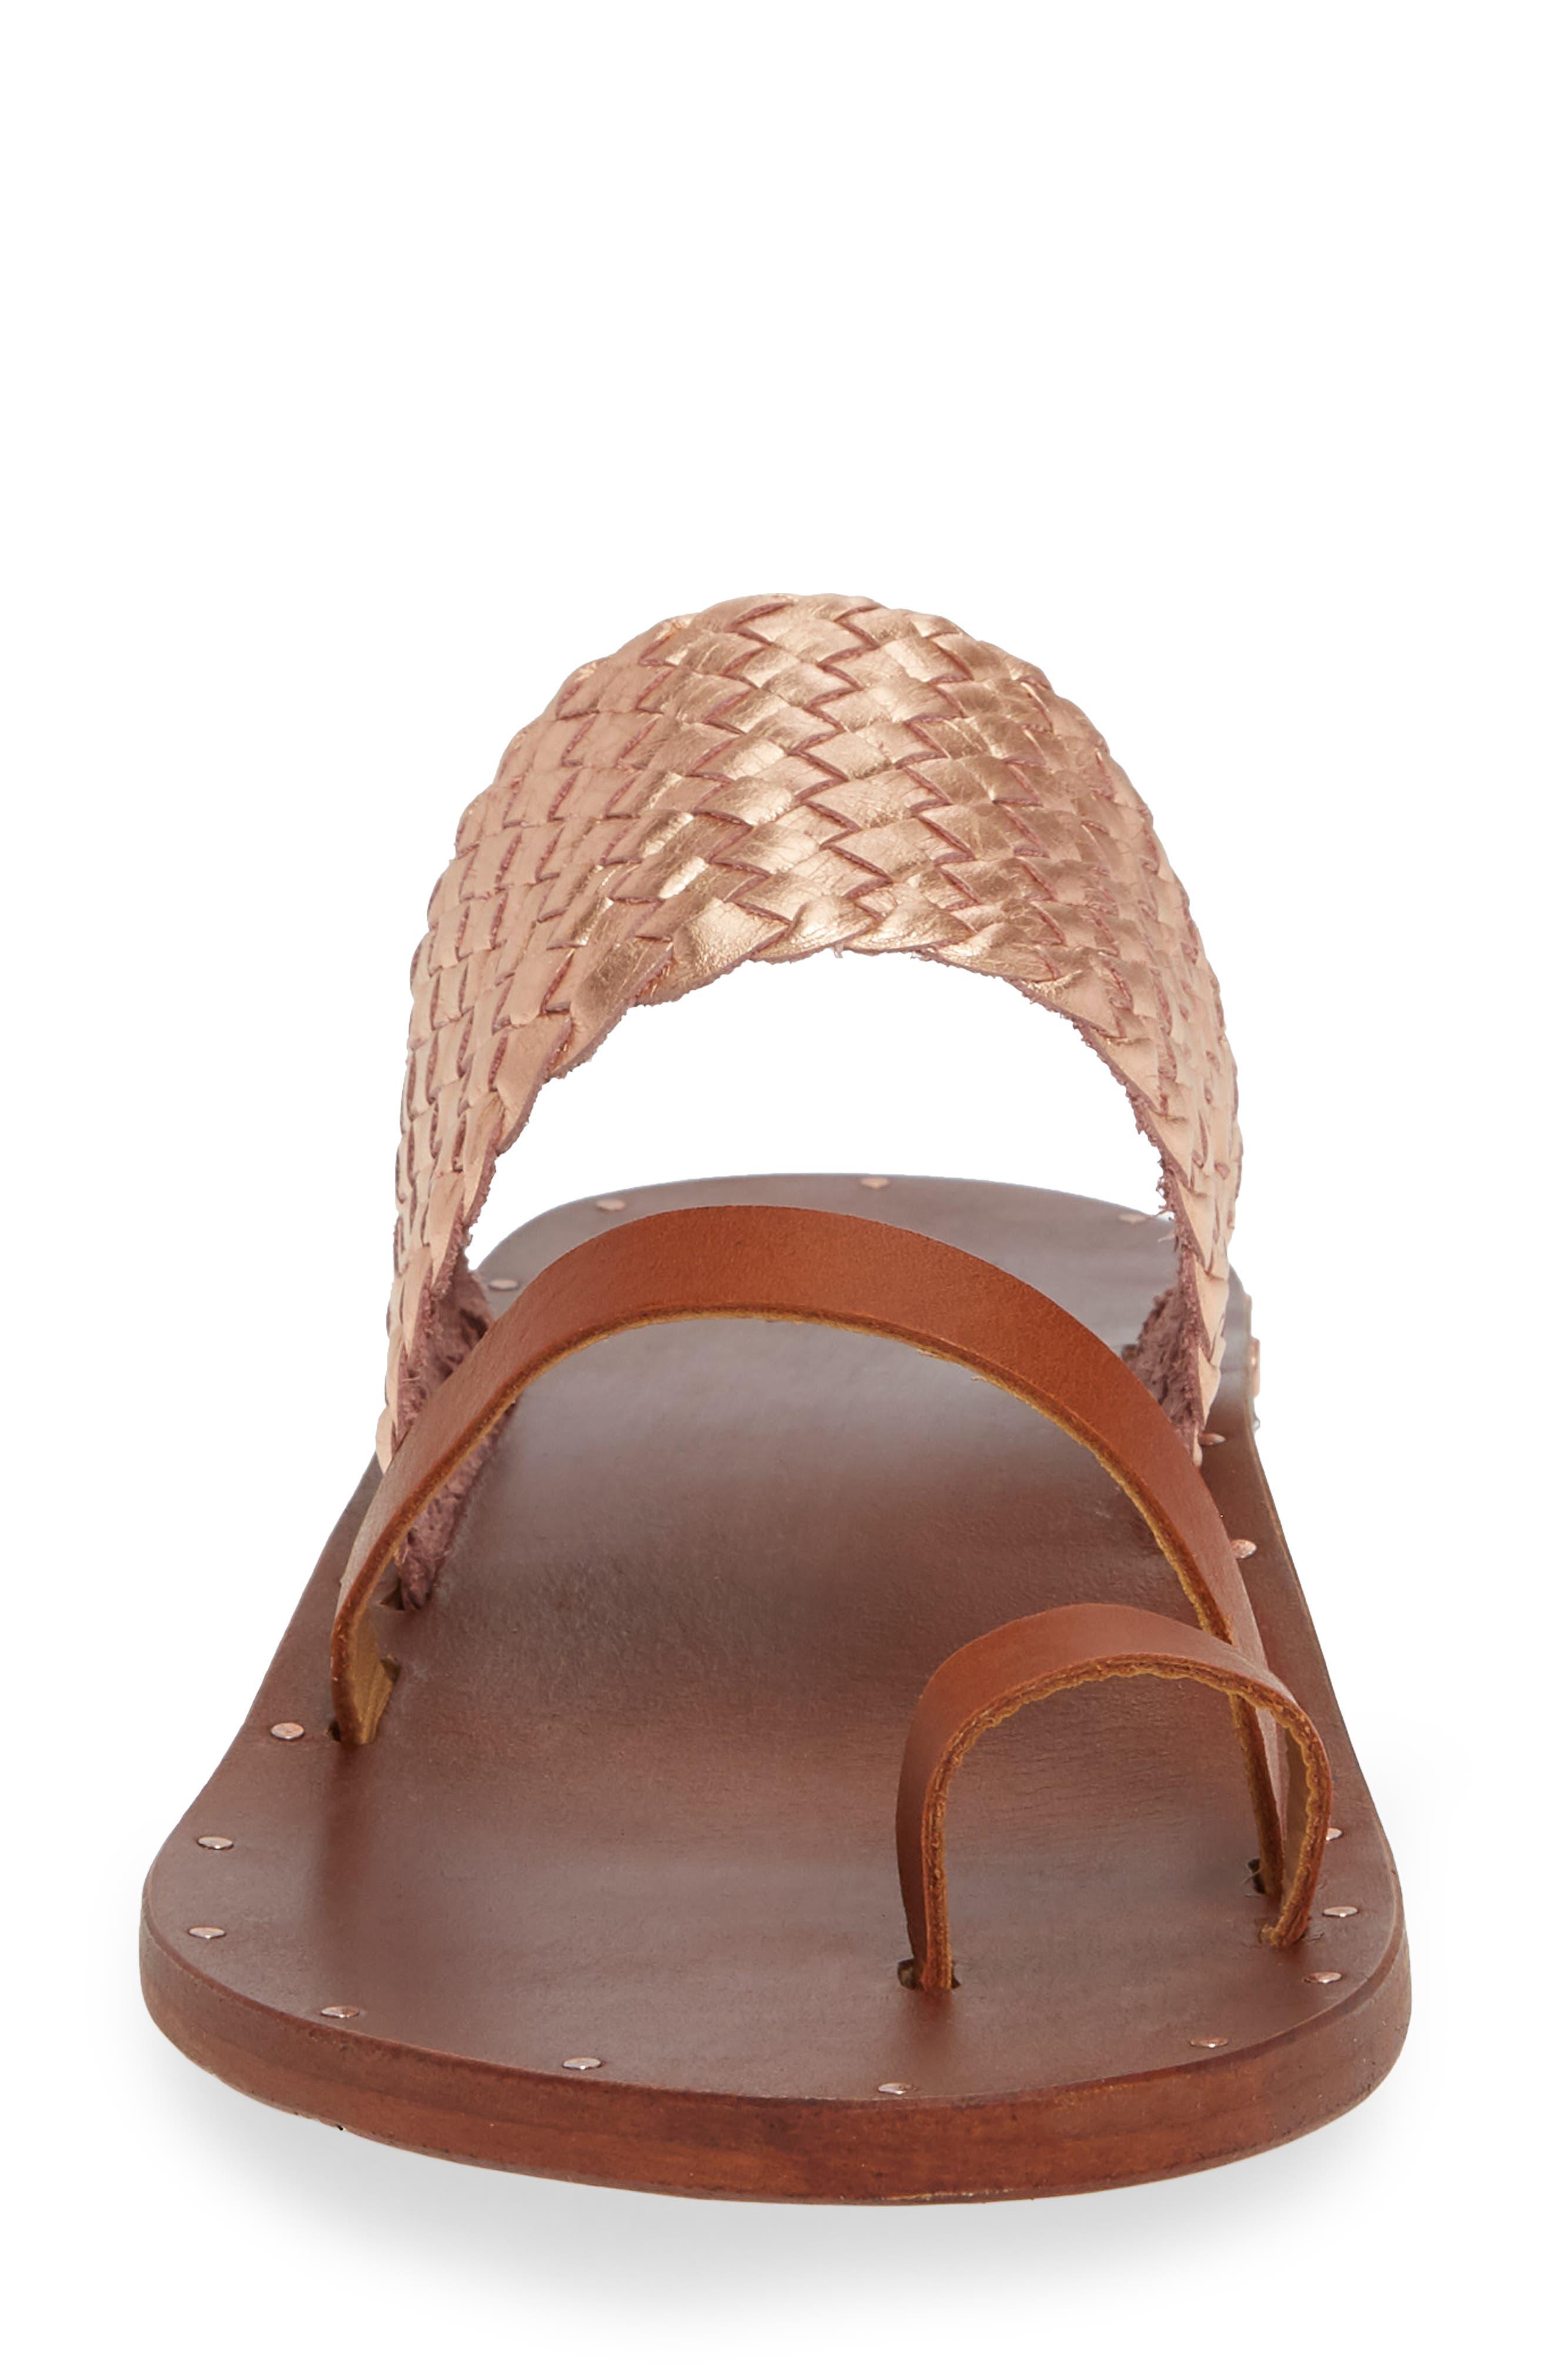 Cockatiel Woven Slide Sandal,                             Alternate thumbnail 4, color,                             ROSE/ TAN